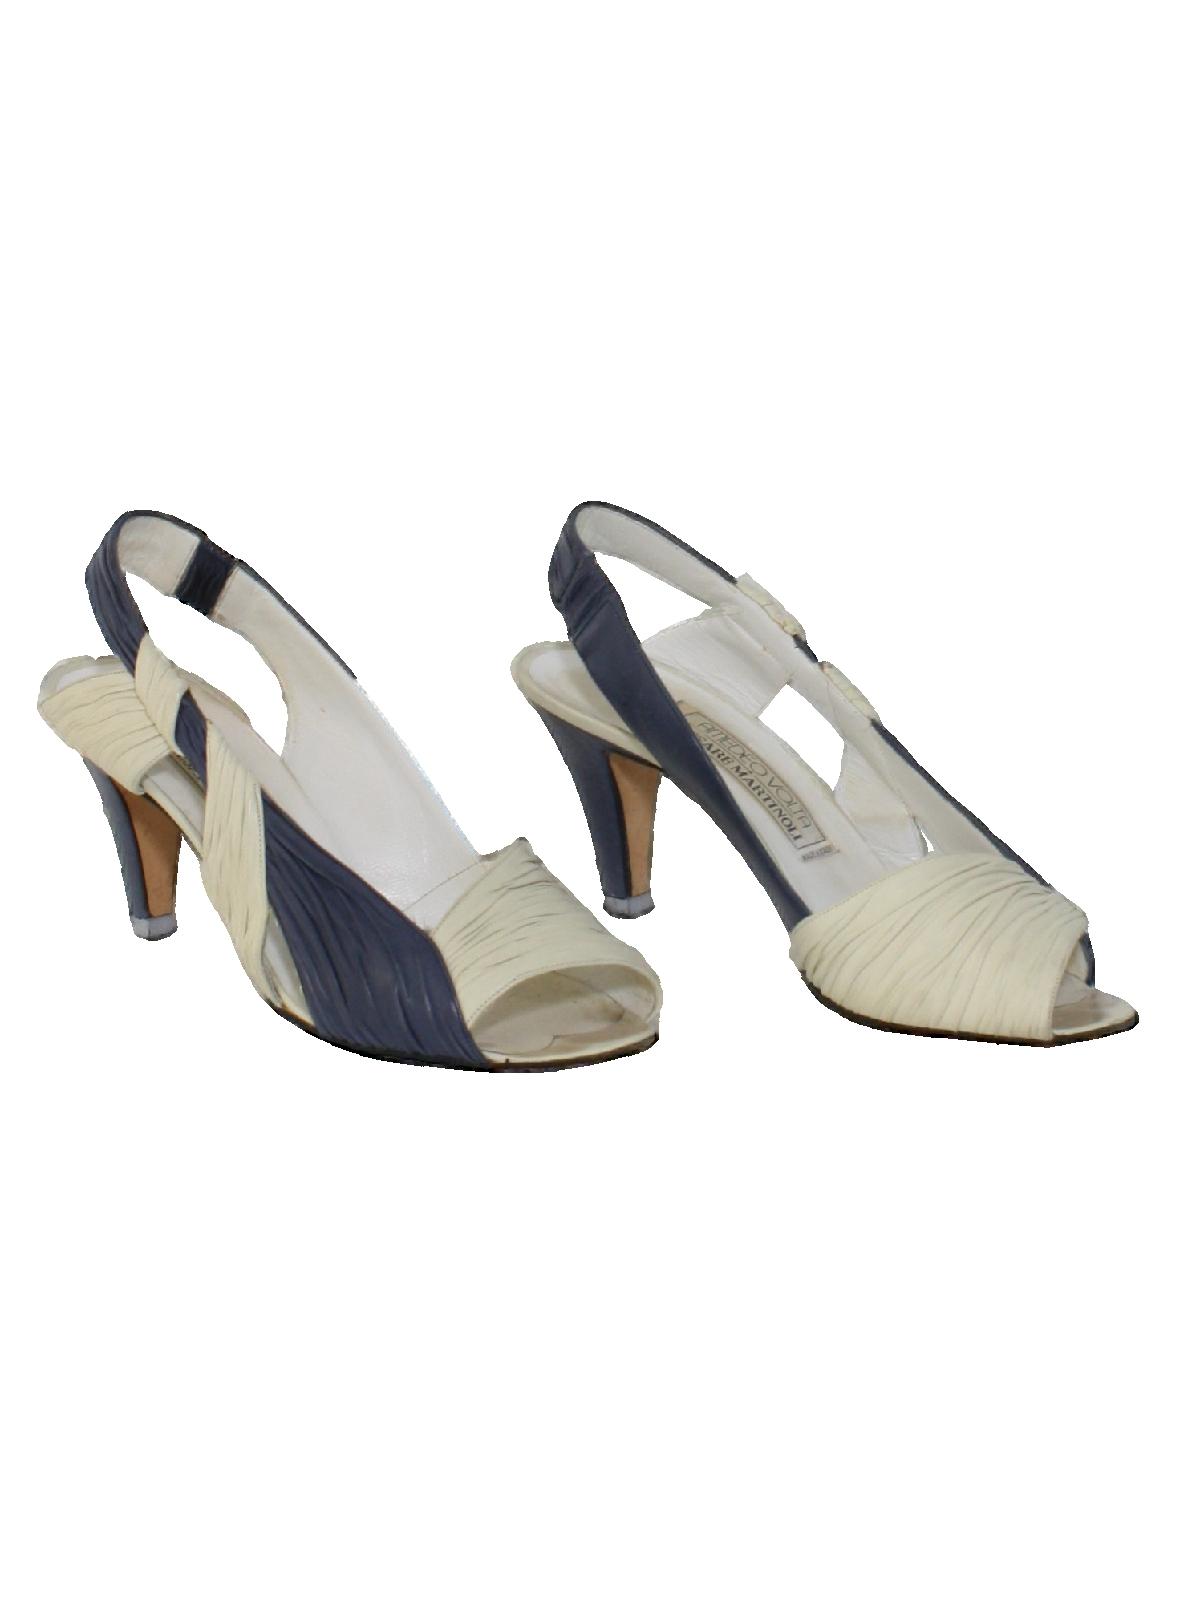 4f06b42d10552 1980's Cesare Martinoli Amedeo Volta Womens Designer Heels Shoes